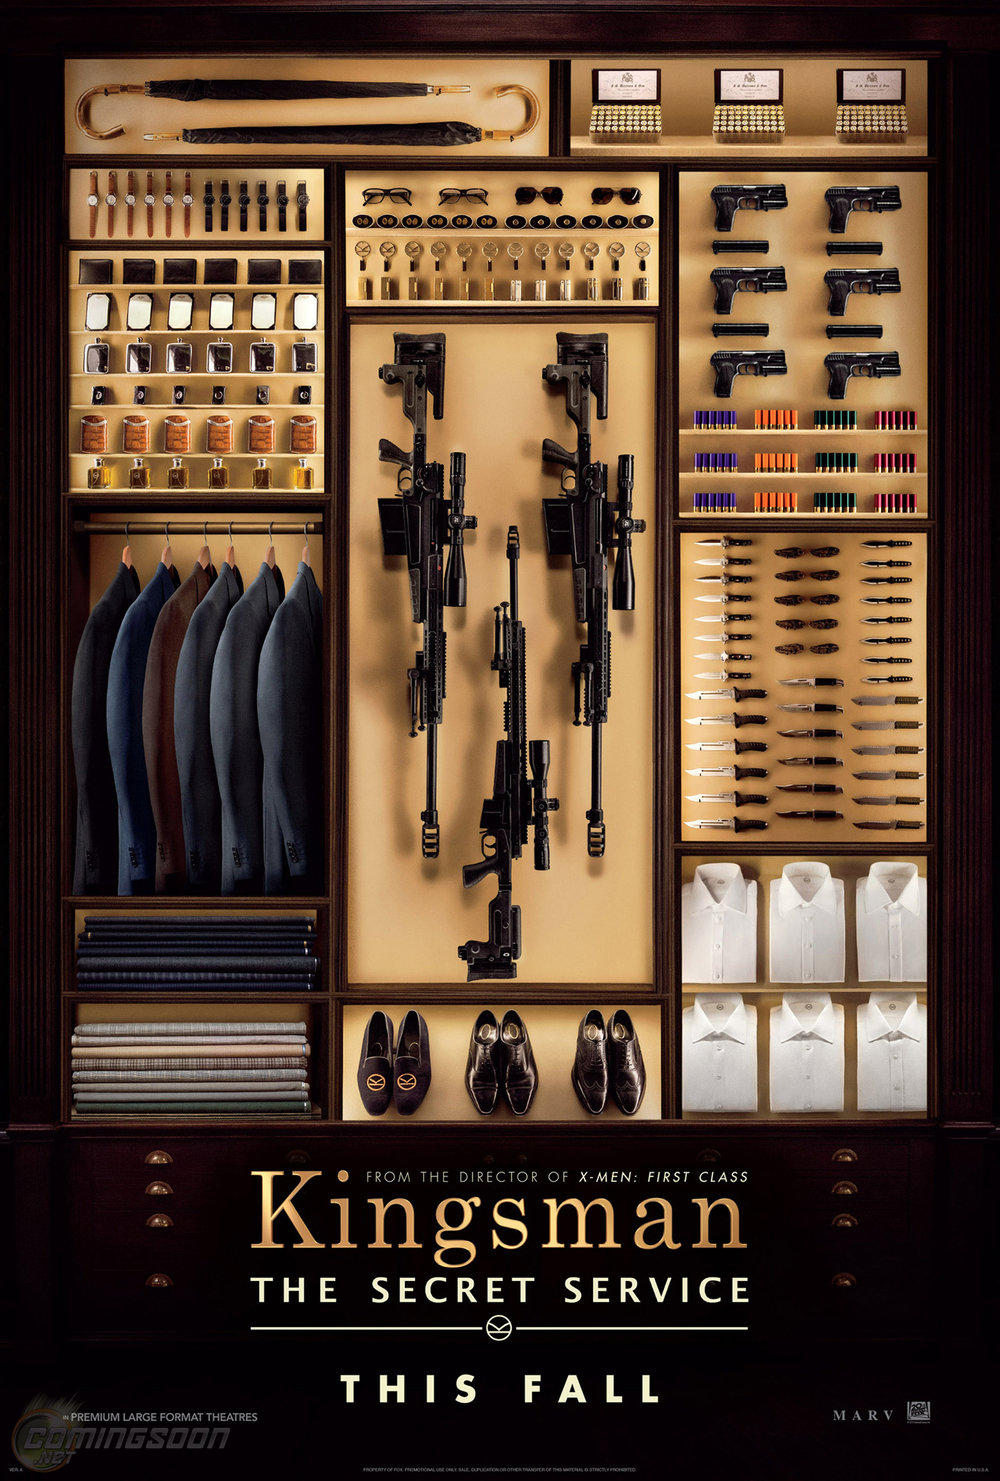 file_118522_1_kingsmanposterlarge